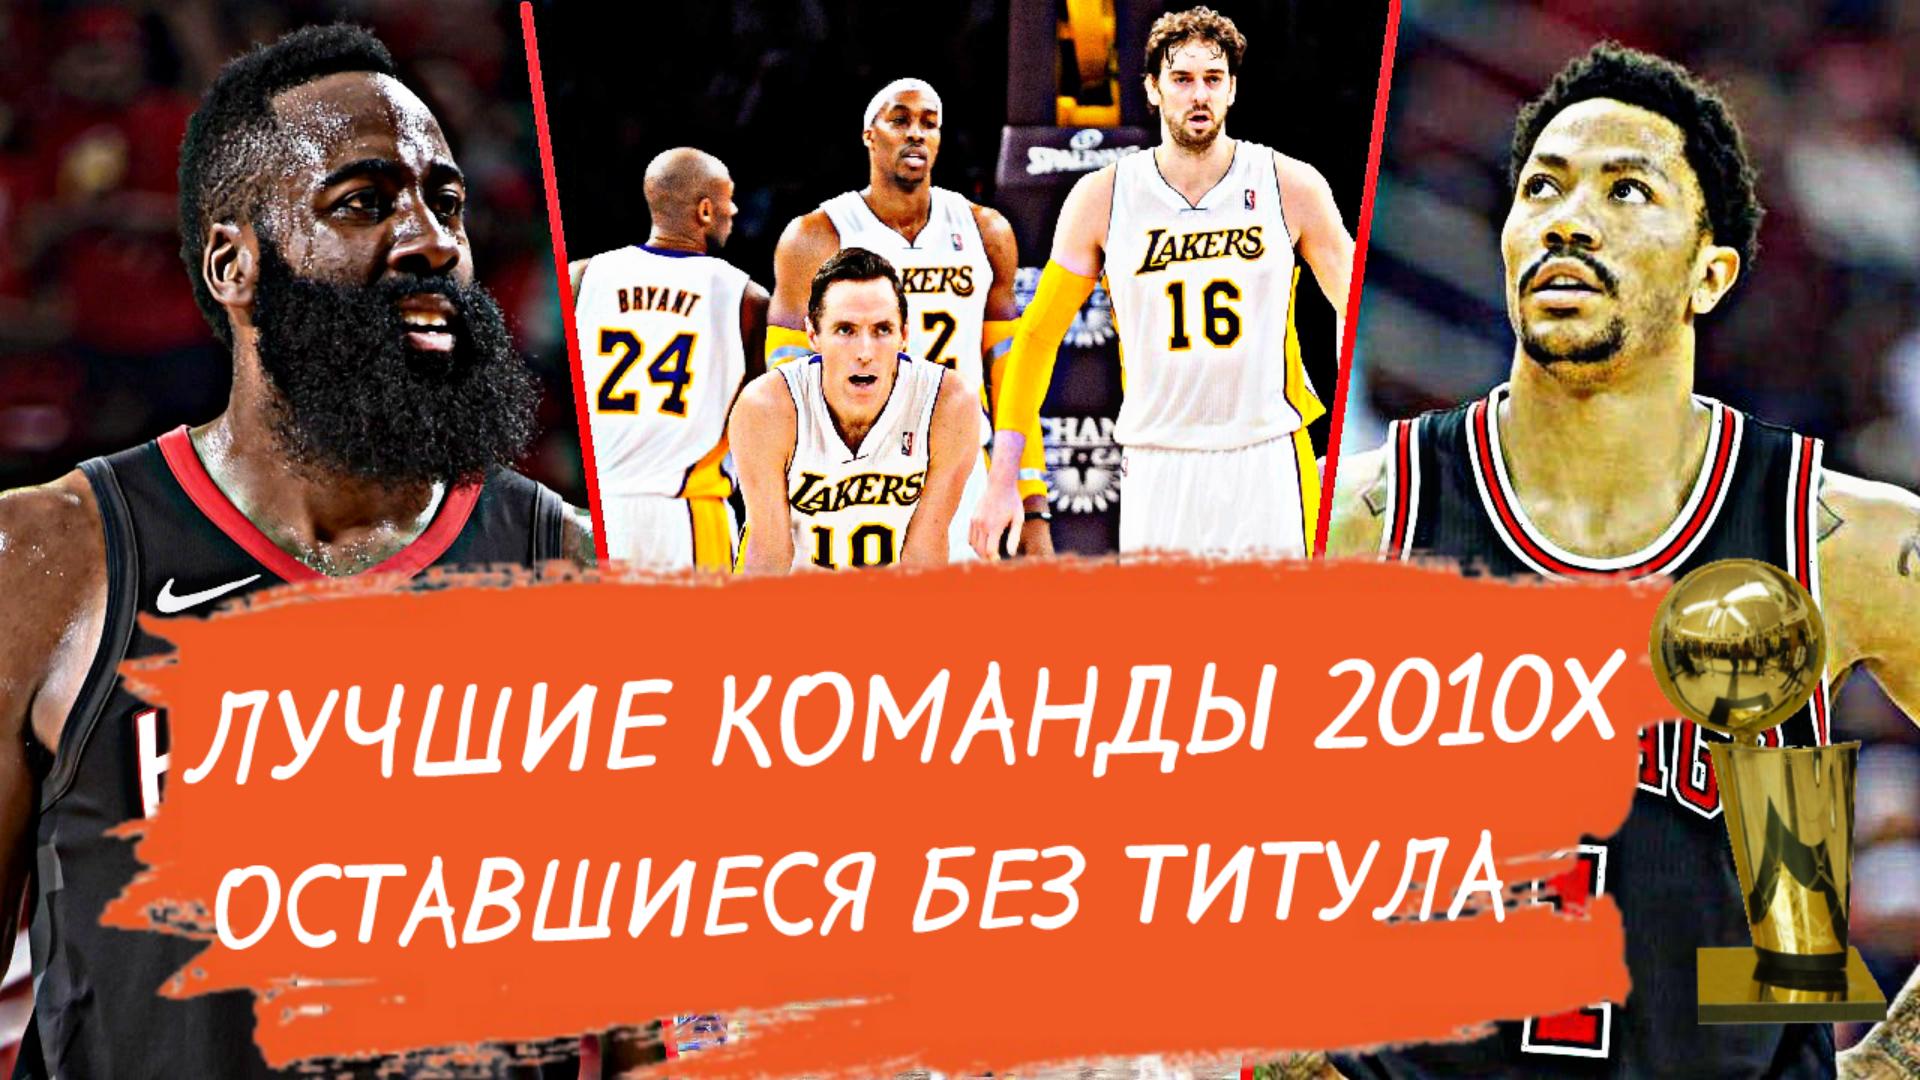 НБА, НБА плей-офф, Чикаго, Оклахома-Сити, Голден Стэйт, Деррик Роуз, Джеймс Харден, Лейкерс, Милуоки, Кобе Брайант